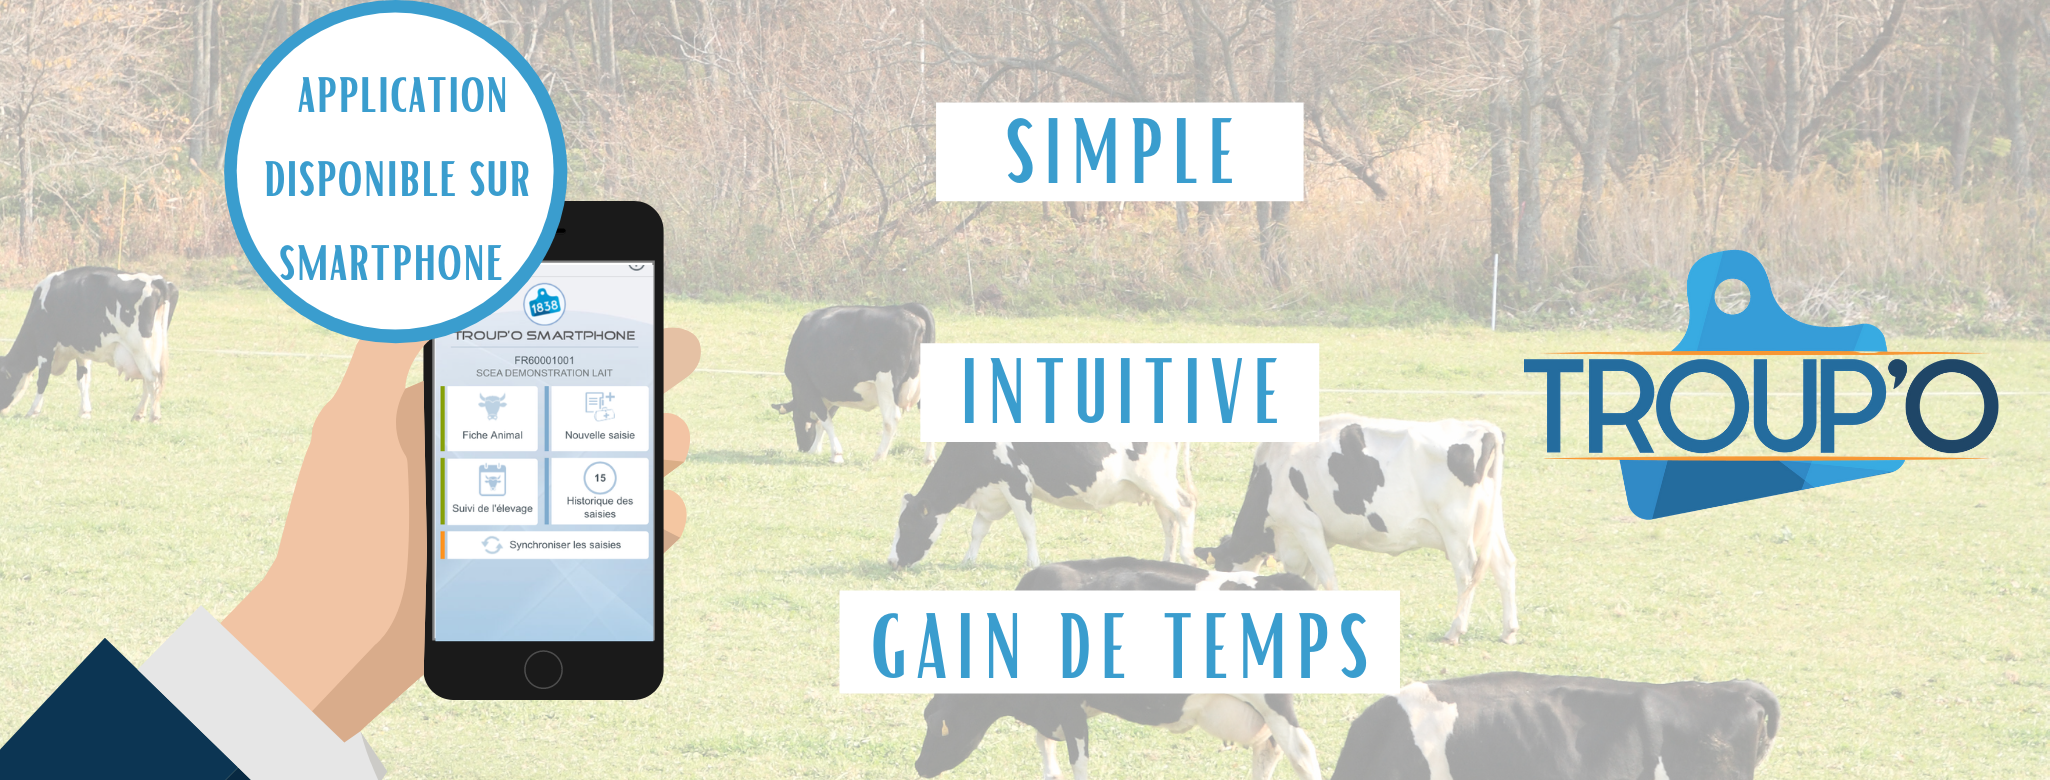 isagri-application-smartphone-simple-pratique-intuitive